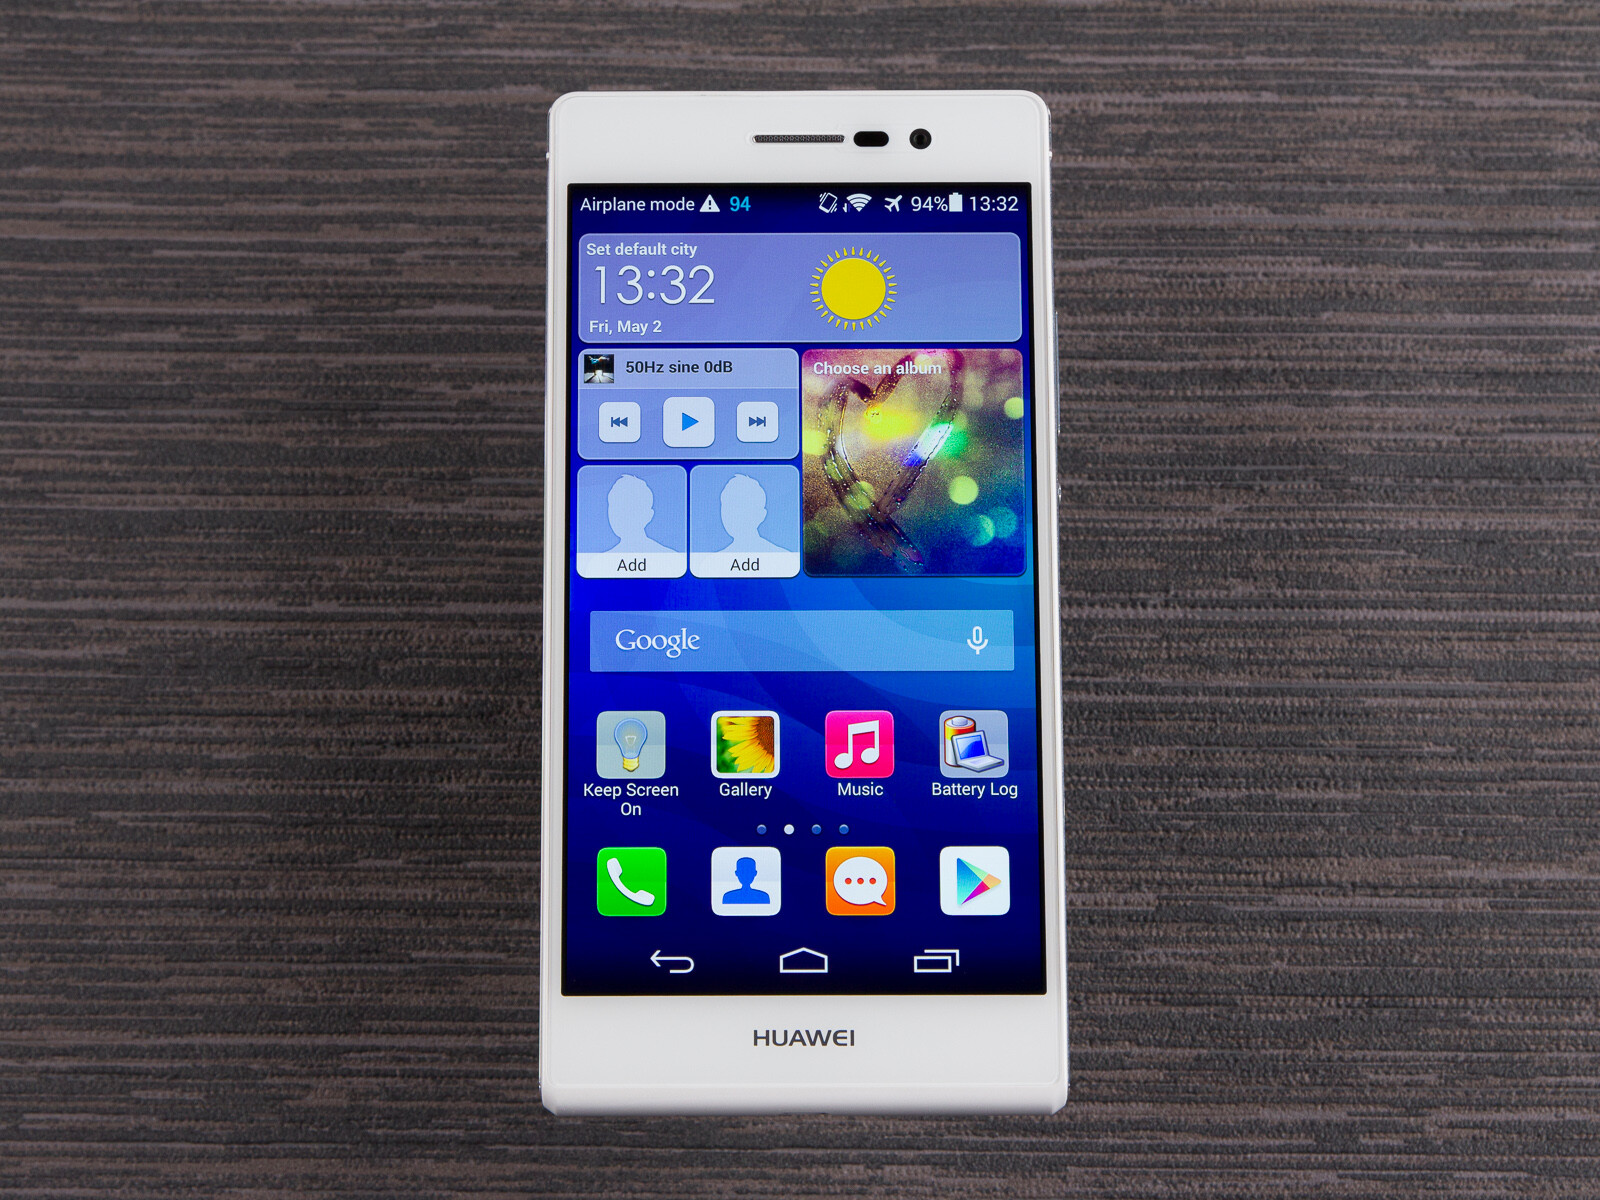 Huawei Ascend P7 Specs